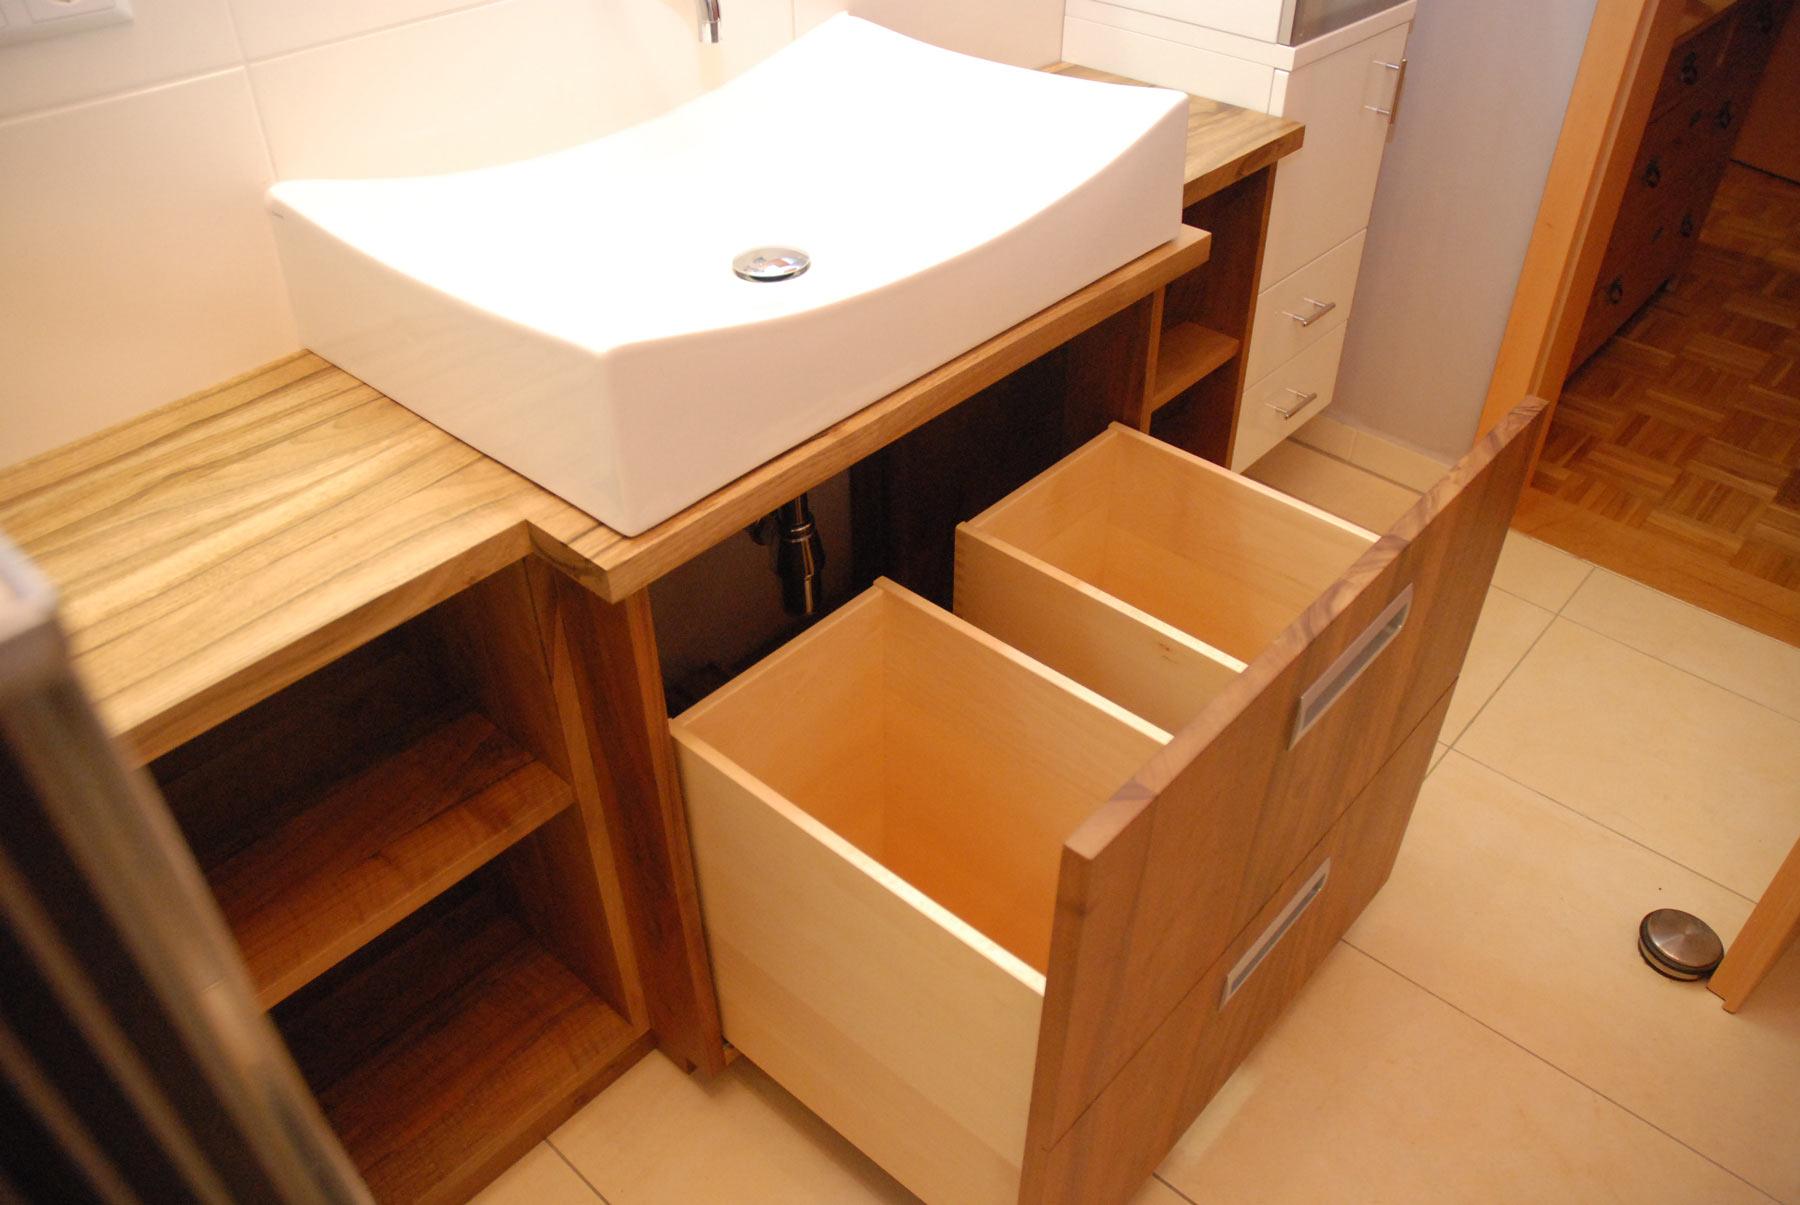 badschrank in nussbaum massiv. Black Bedroom Furniture Sets. Home Design Ideas